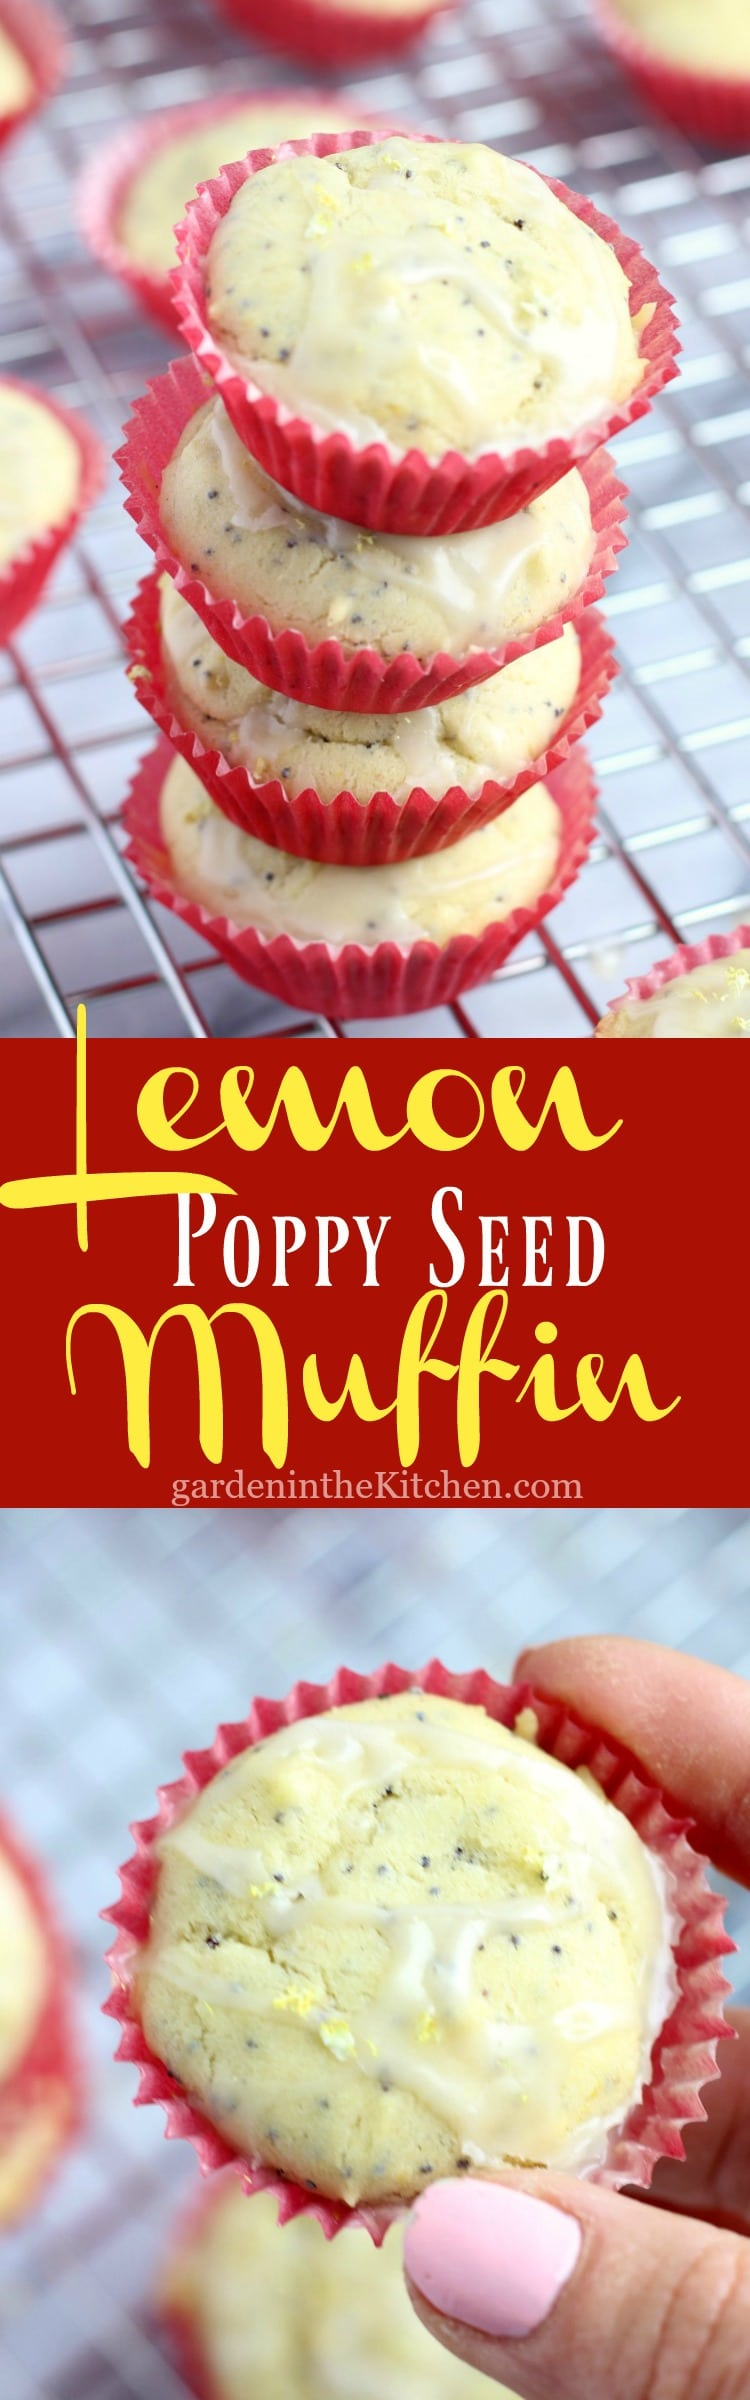 Gluten-free Lemon Poppy Seed Mini Muffin